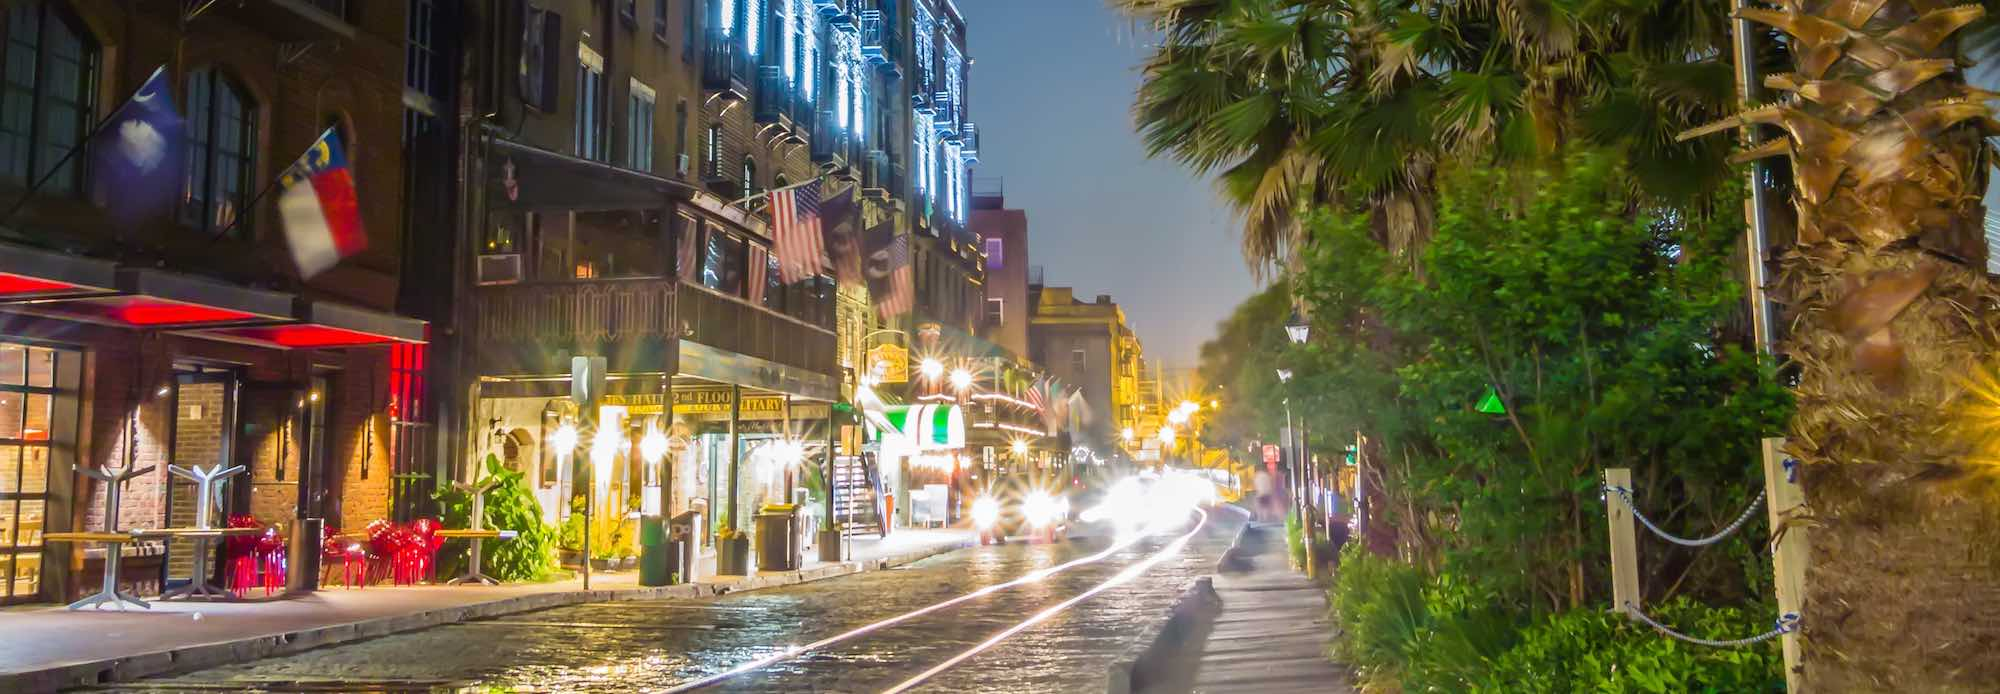 Night time view of River Street in Savannah, GA.